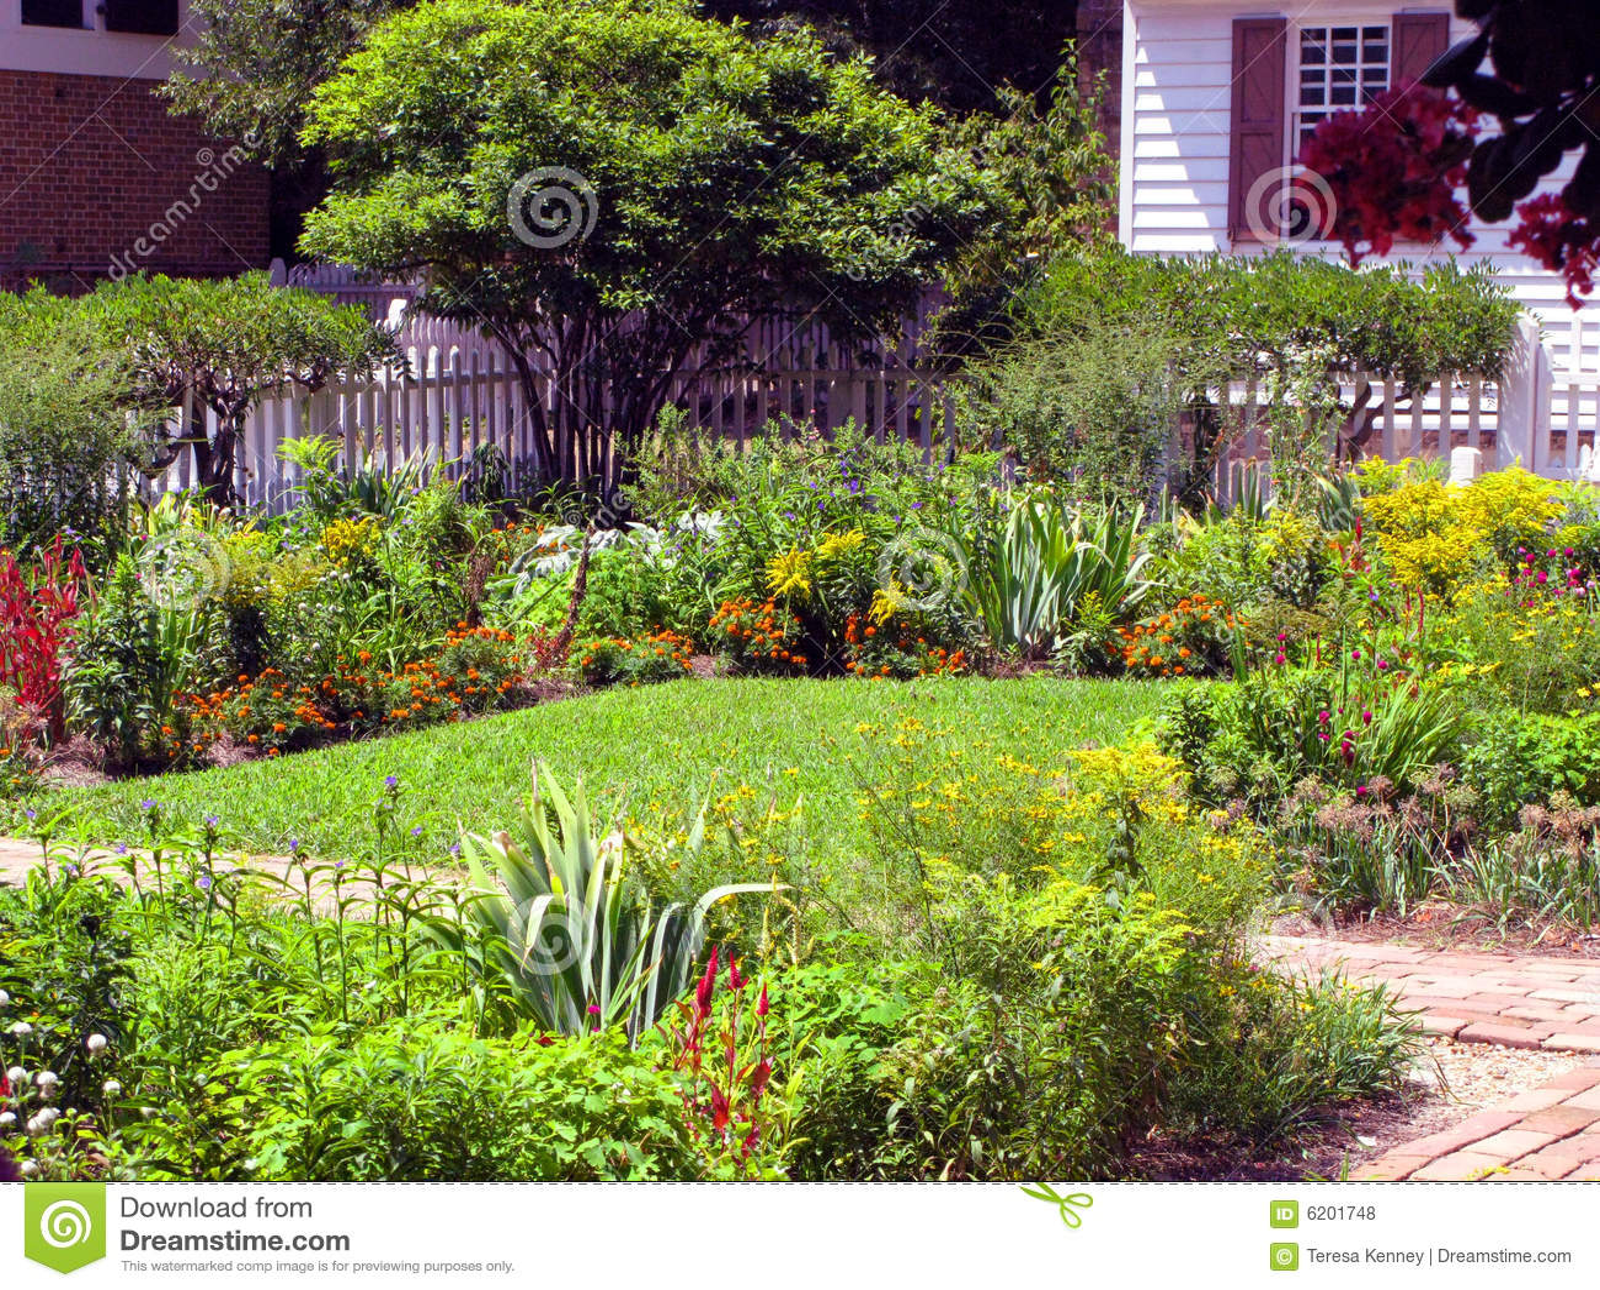 Jardins Bonitos Fotos de Stock Royalty Free  Imagem 6201748